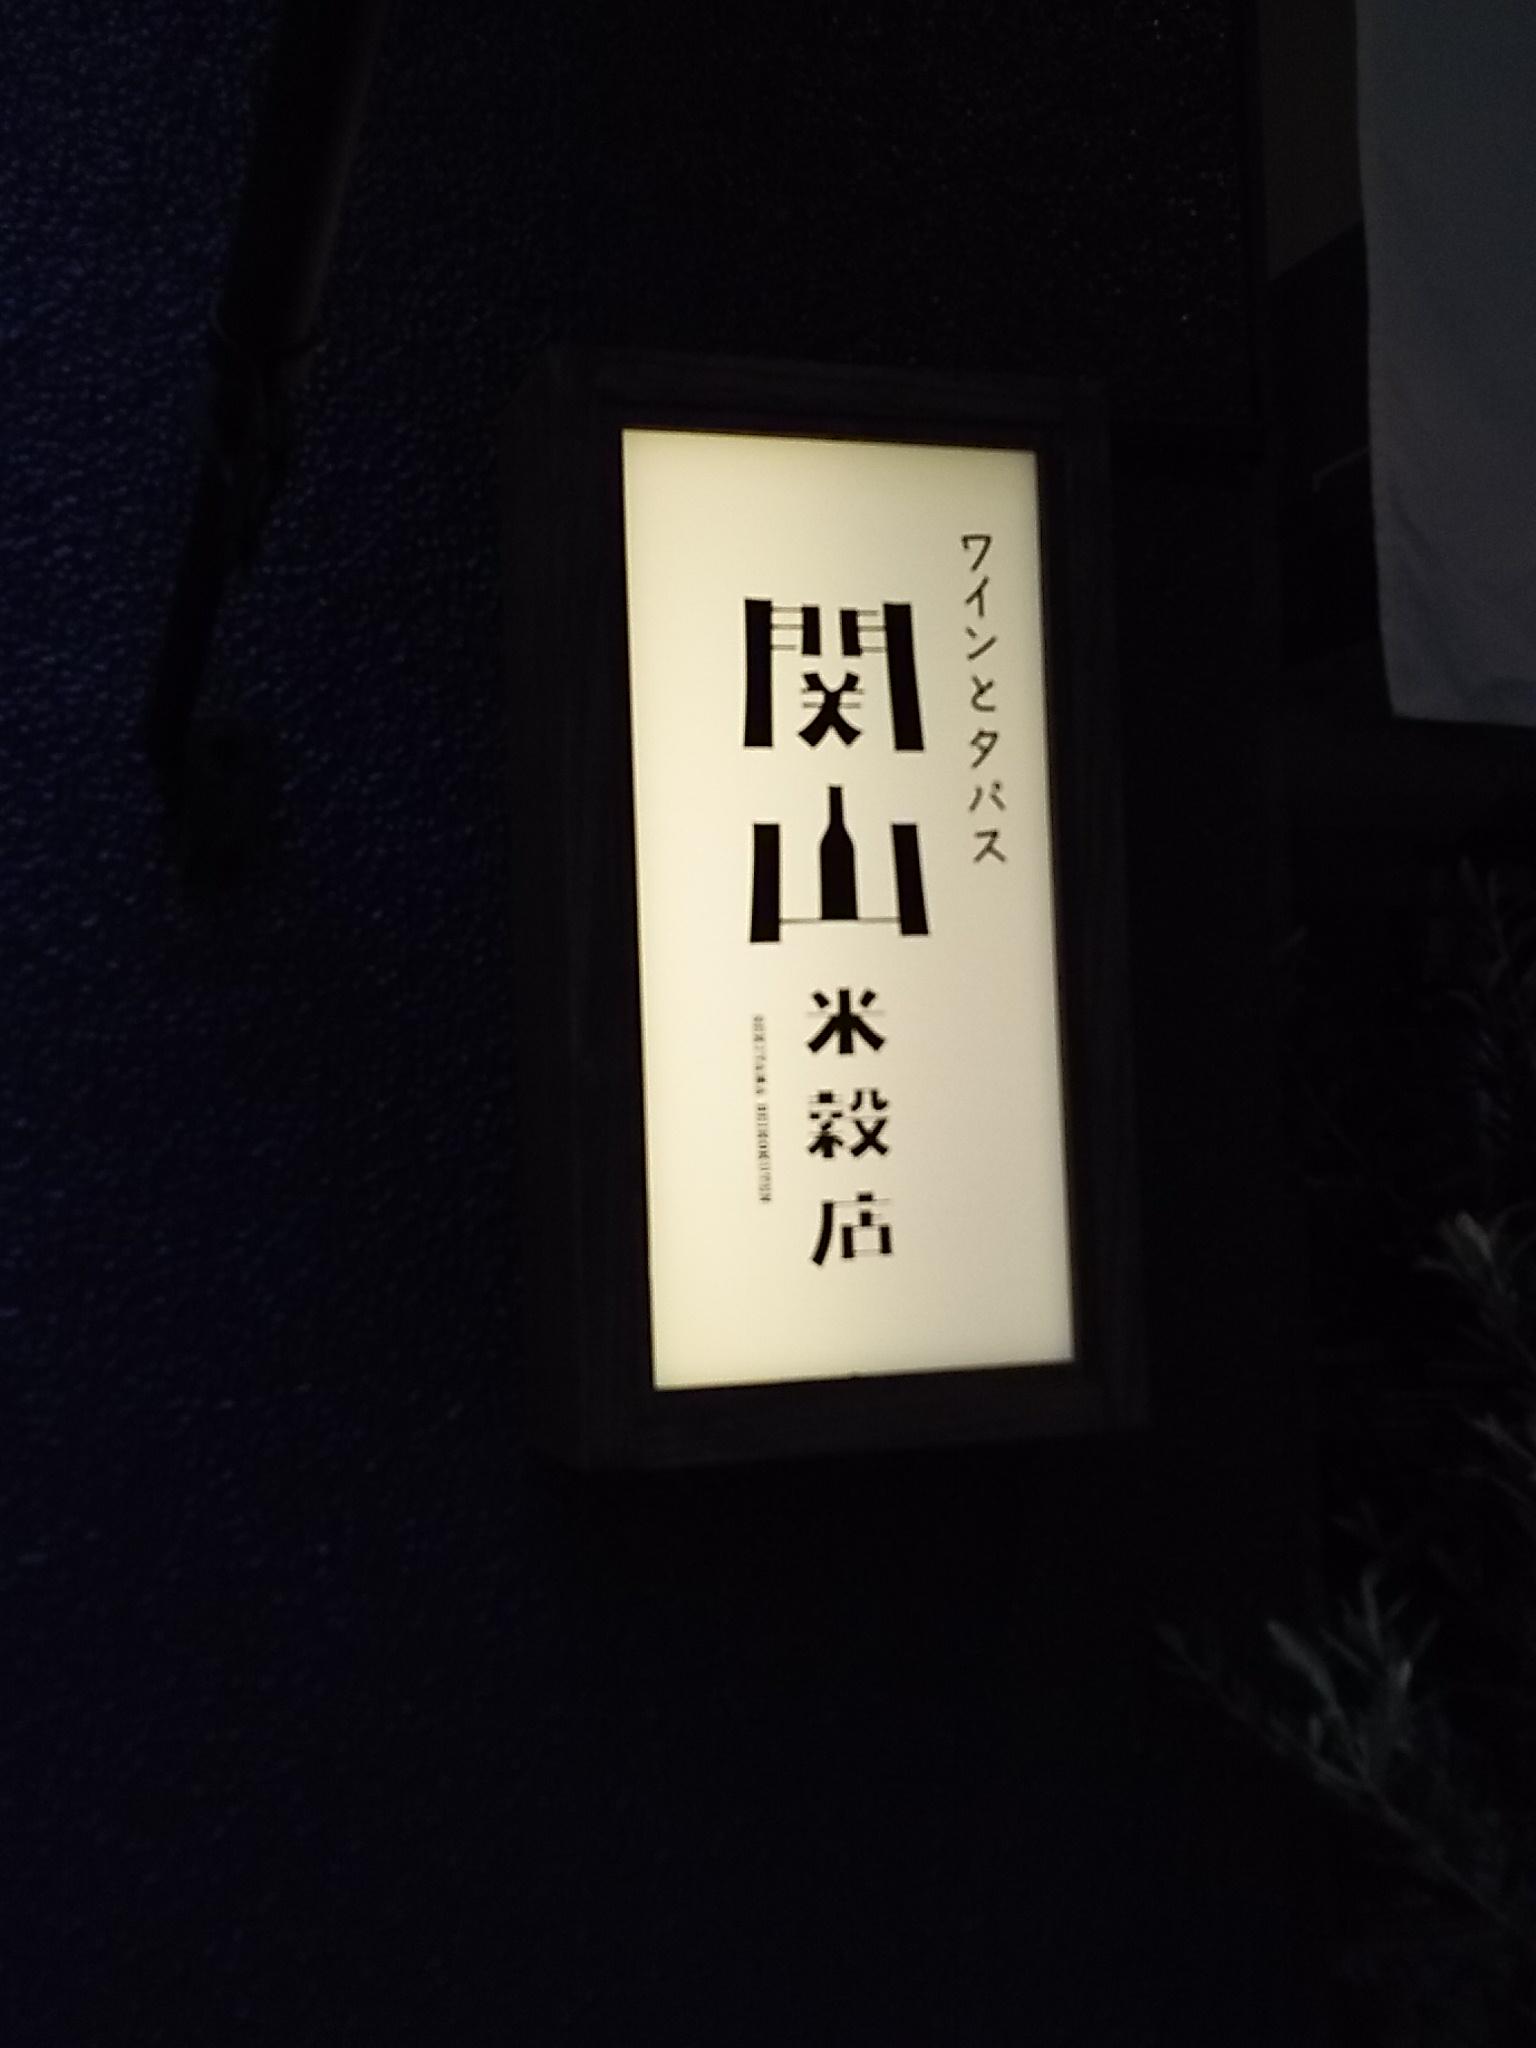 DSC_4710.JPG